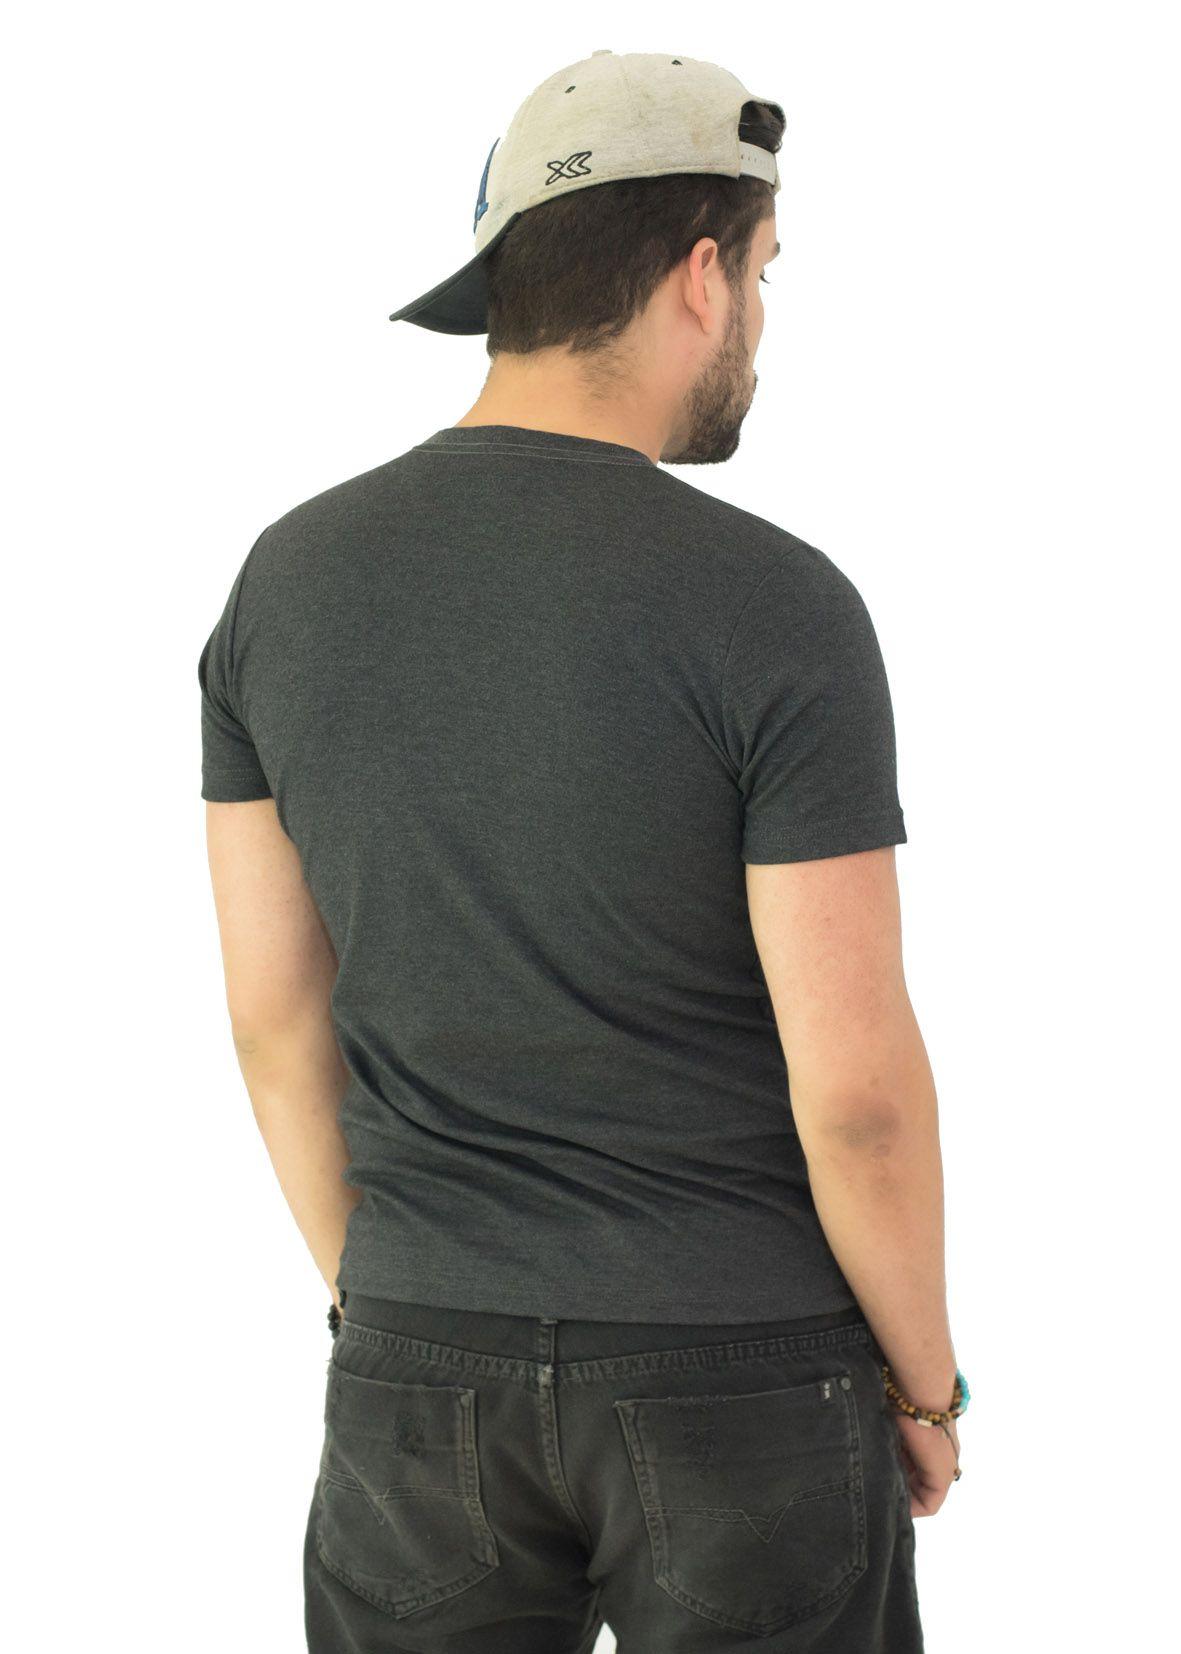 Camiseta Basic Brb Mescla Escuro SLIM FIT  - Ca Brasileira